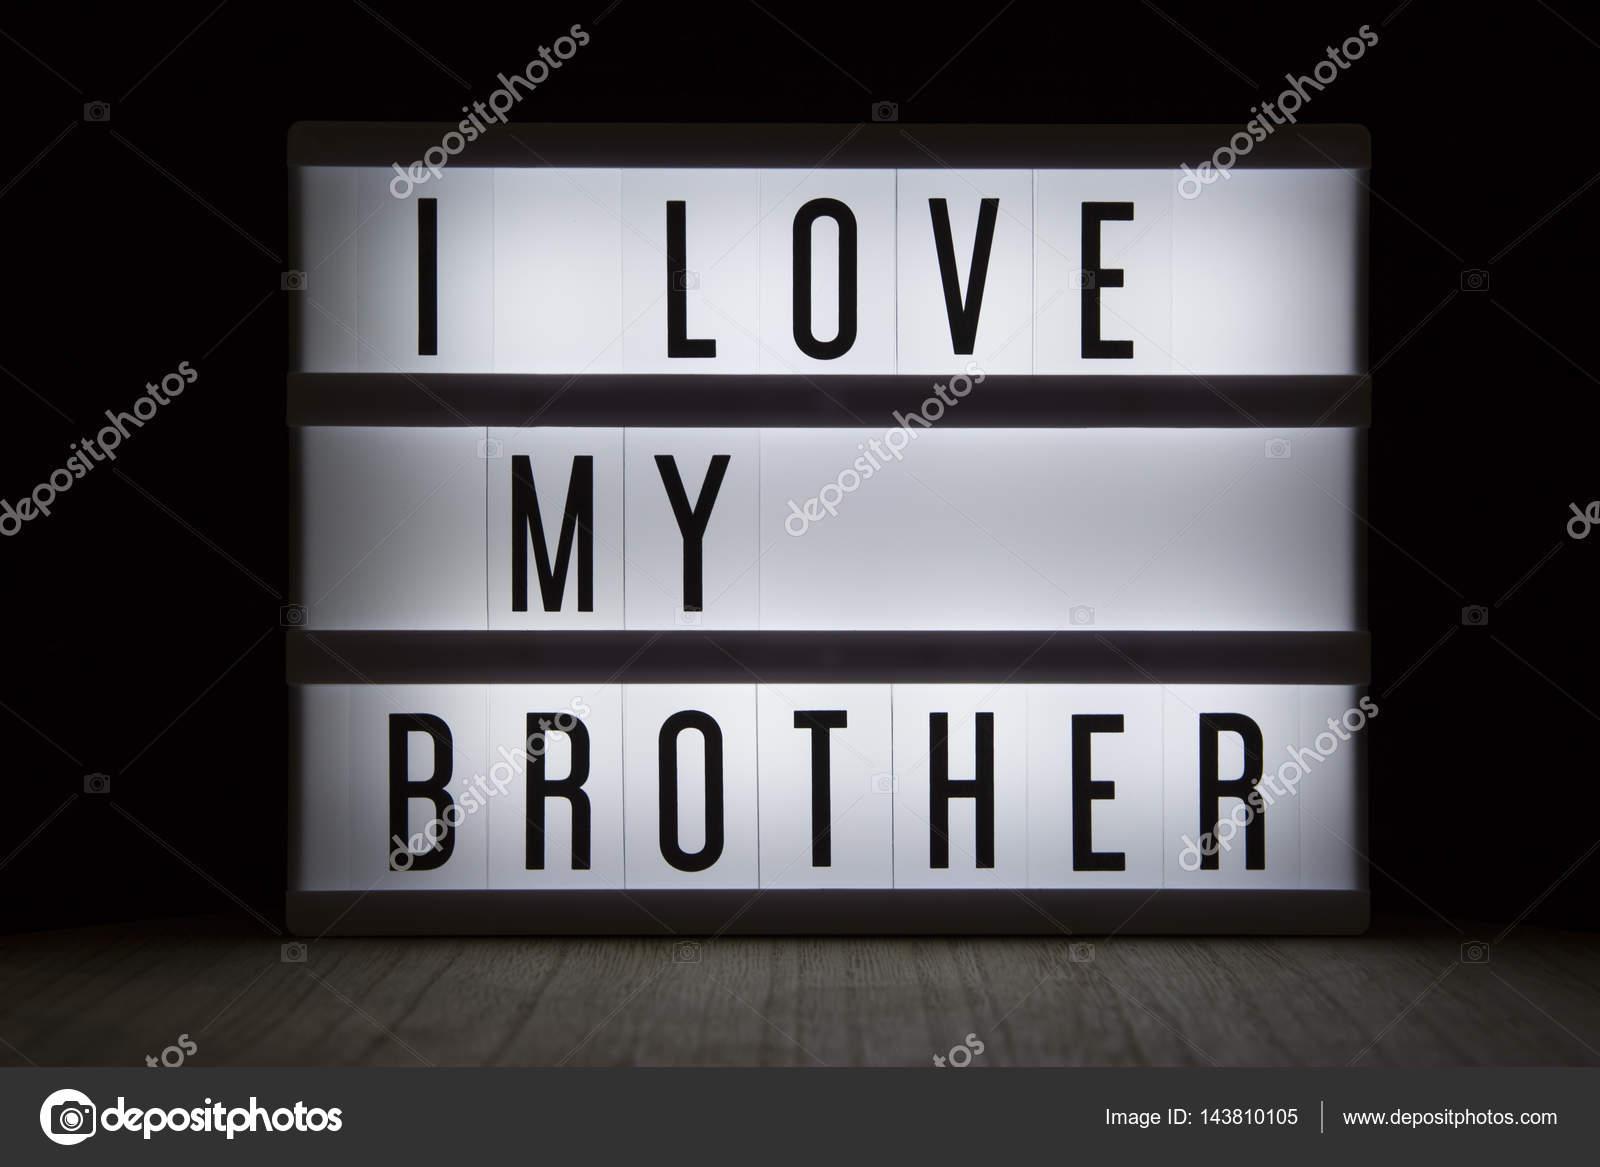 I Love Mi Hermano Texto En Lightbox Foto De Stock Wvdz